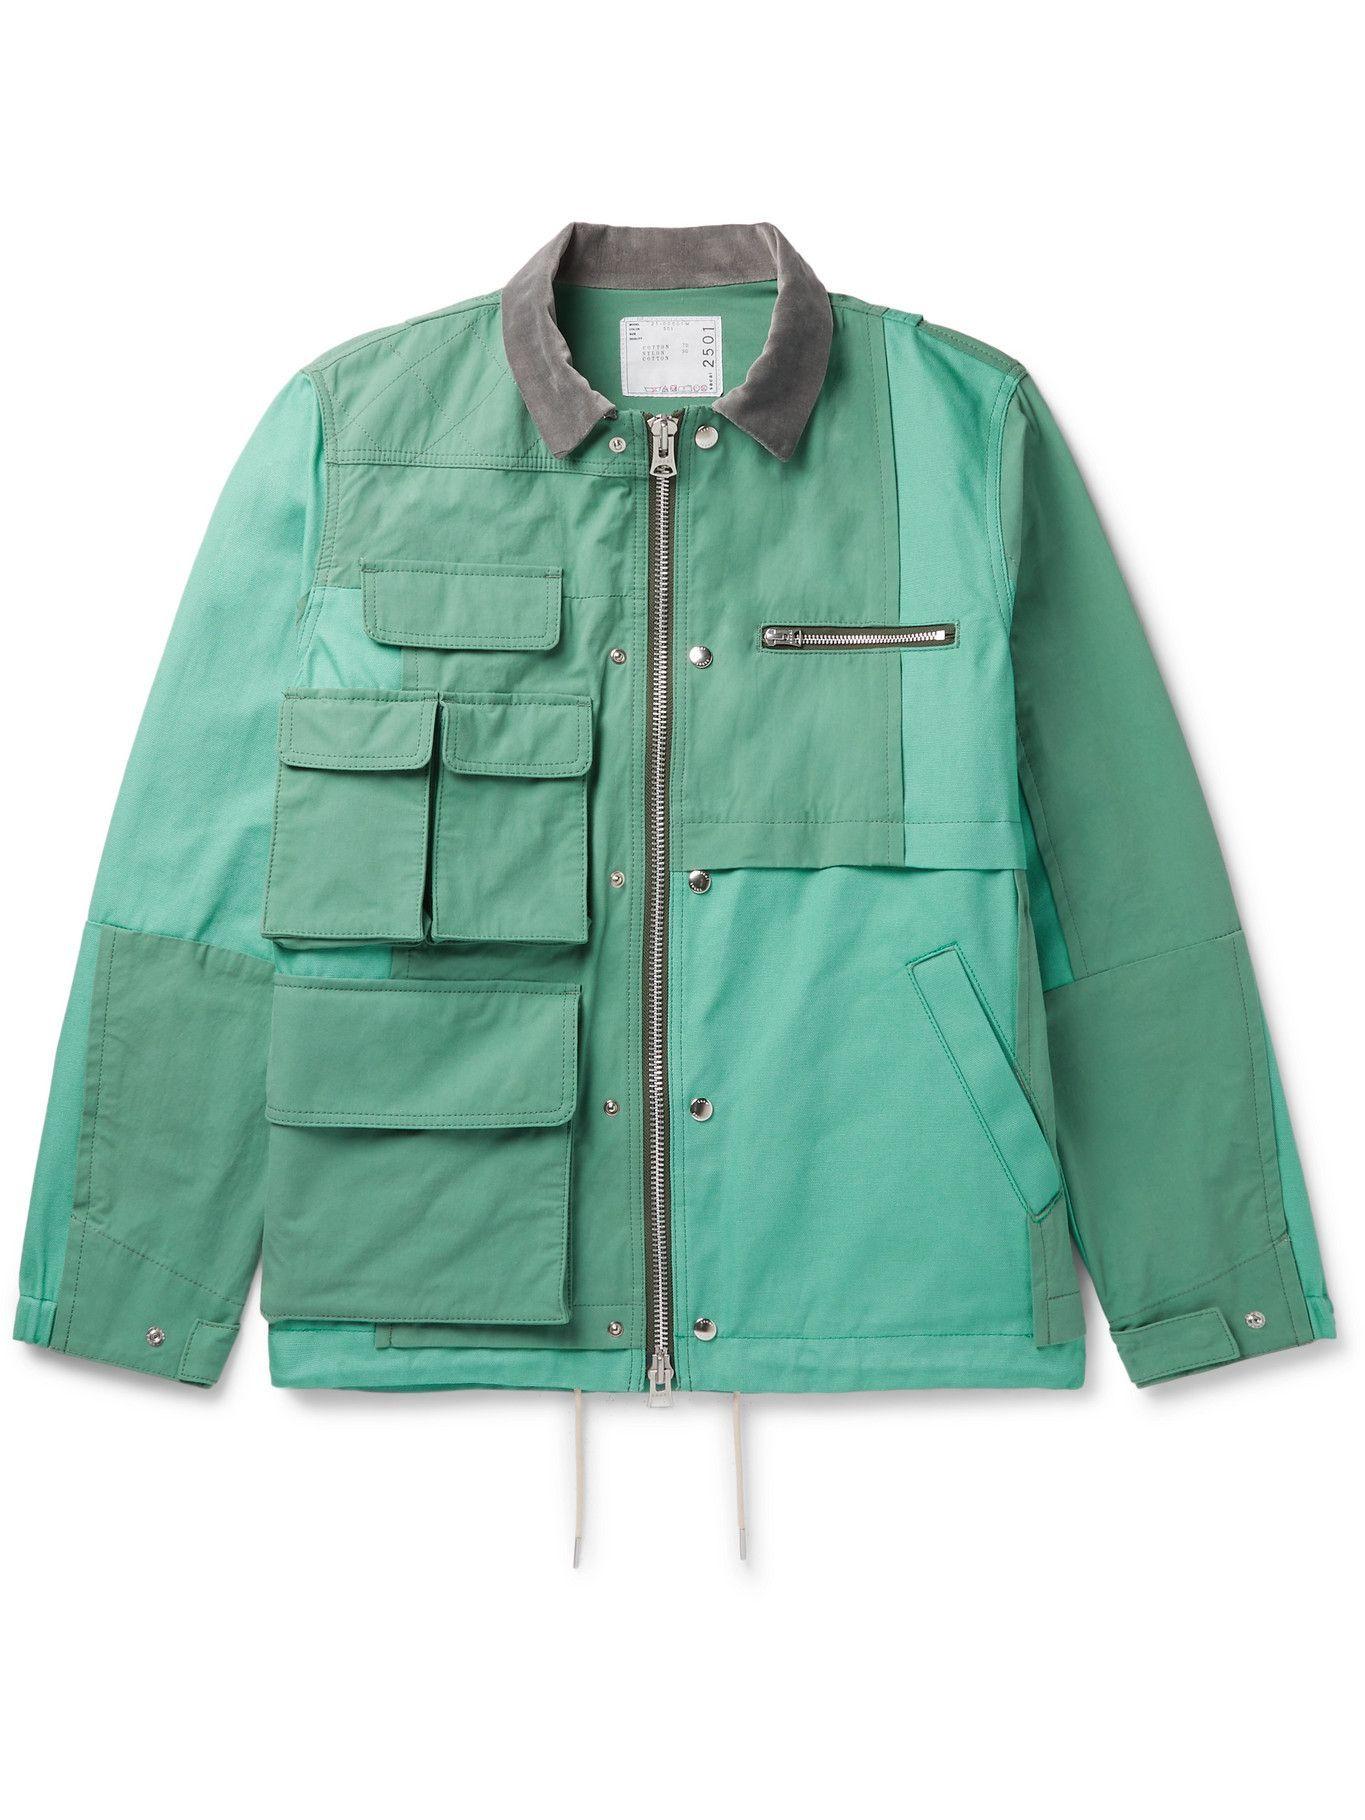 SACAI - Asymmetric Panelled Cotton and Nylon-Blend Oxford Jacket - Green